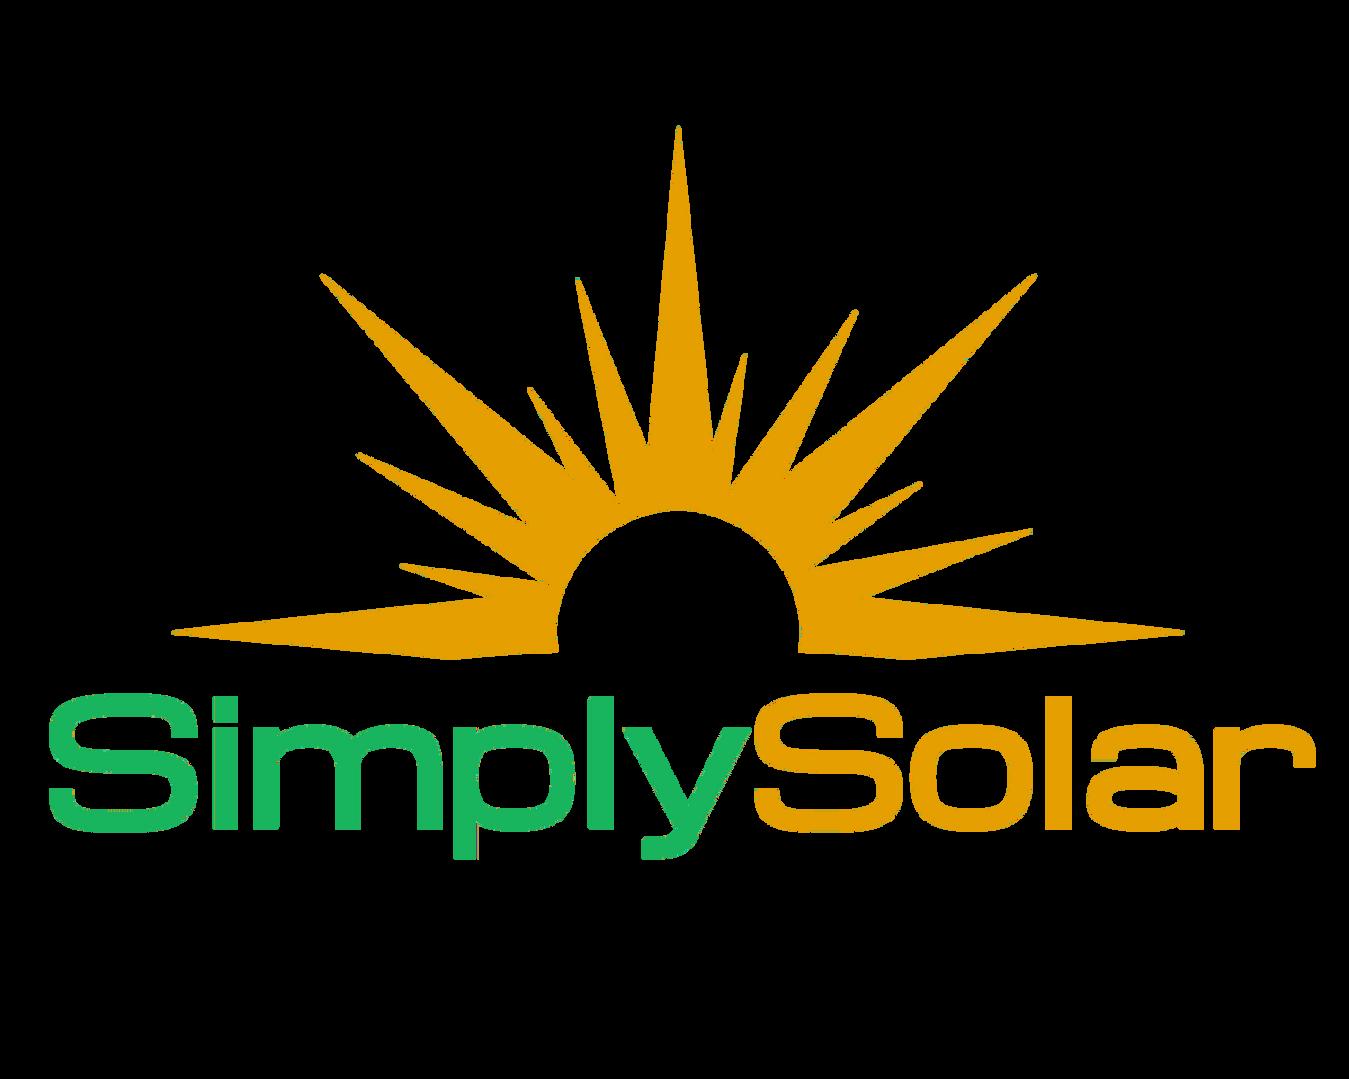 simply-solar-logo.png